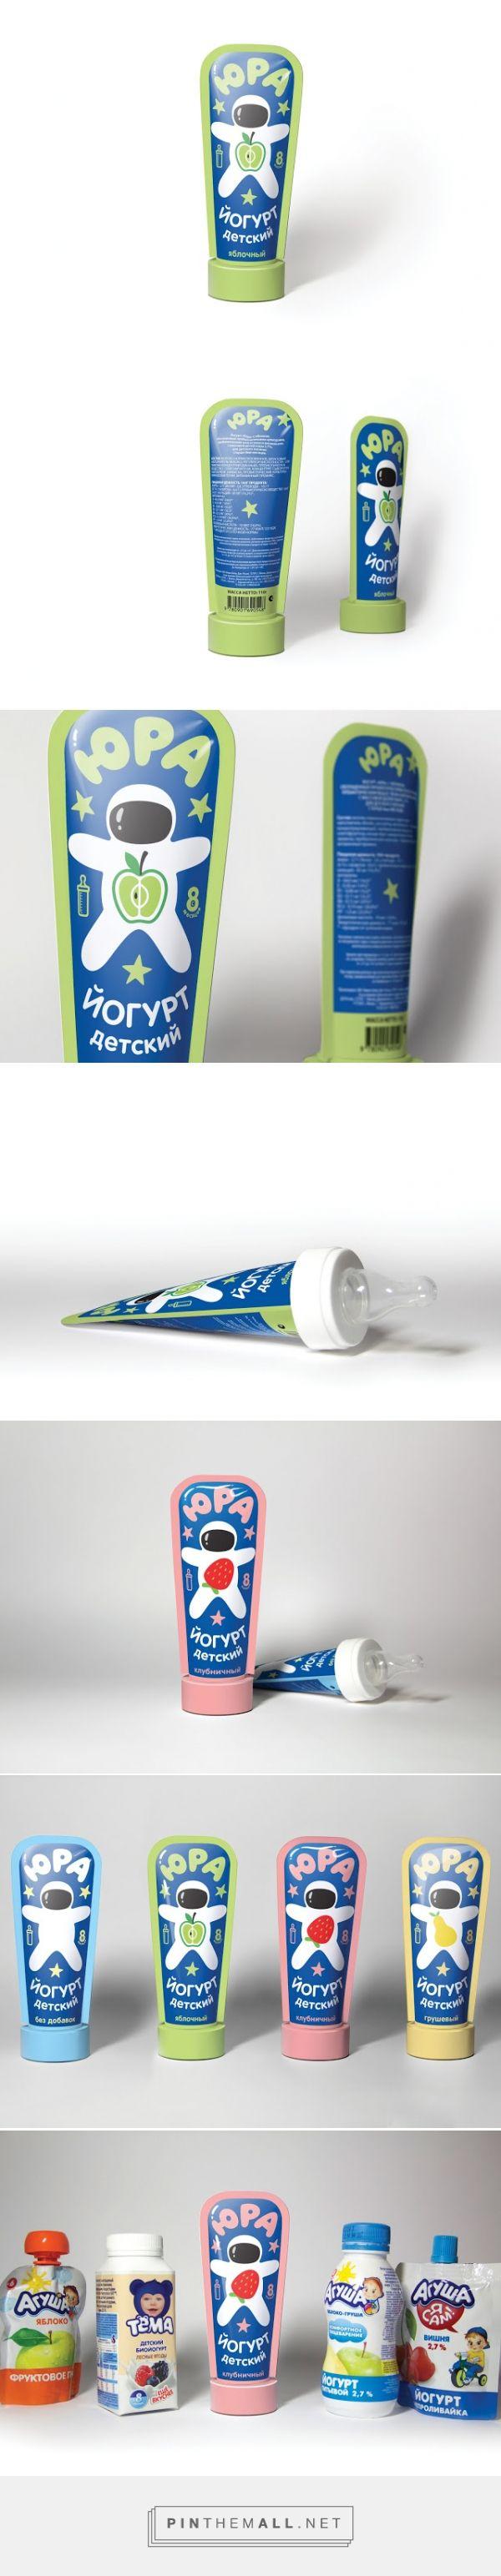 Yura - Yogurt For Babies #concept #packaging by Petr Moskalev - http://www.packagingoftheworld.com/2015/02/yura-yogurt-for-babies-student-project.html